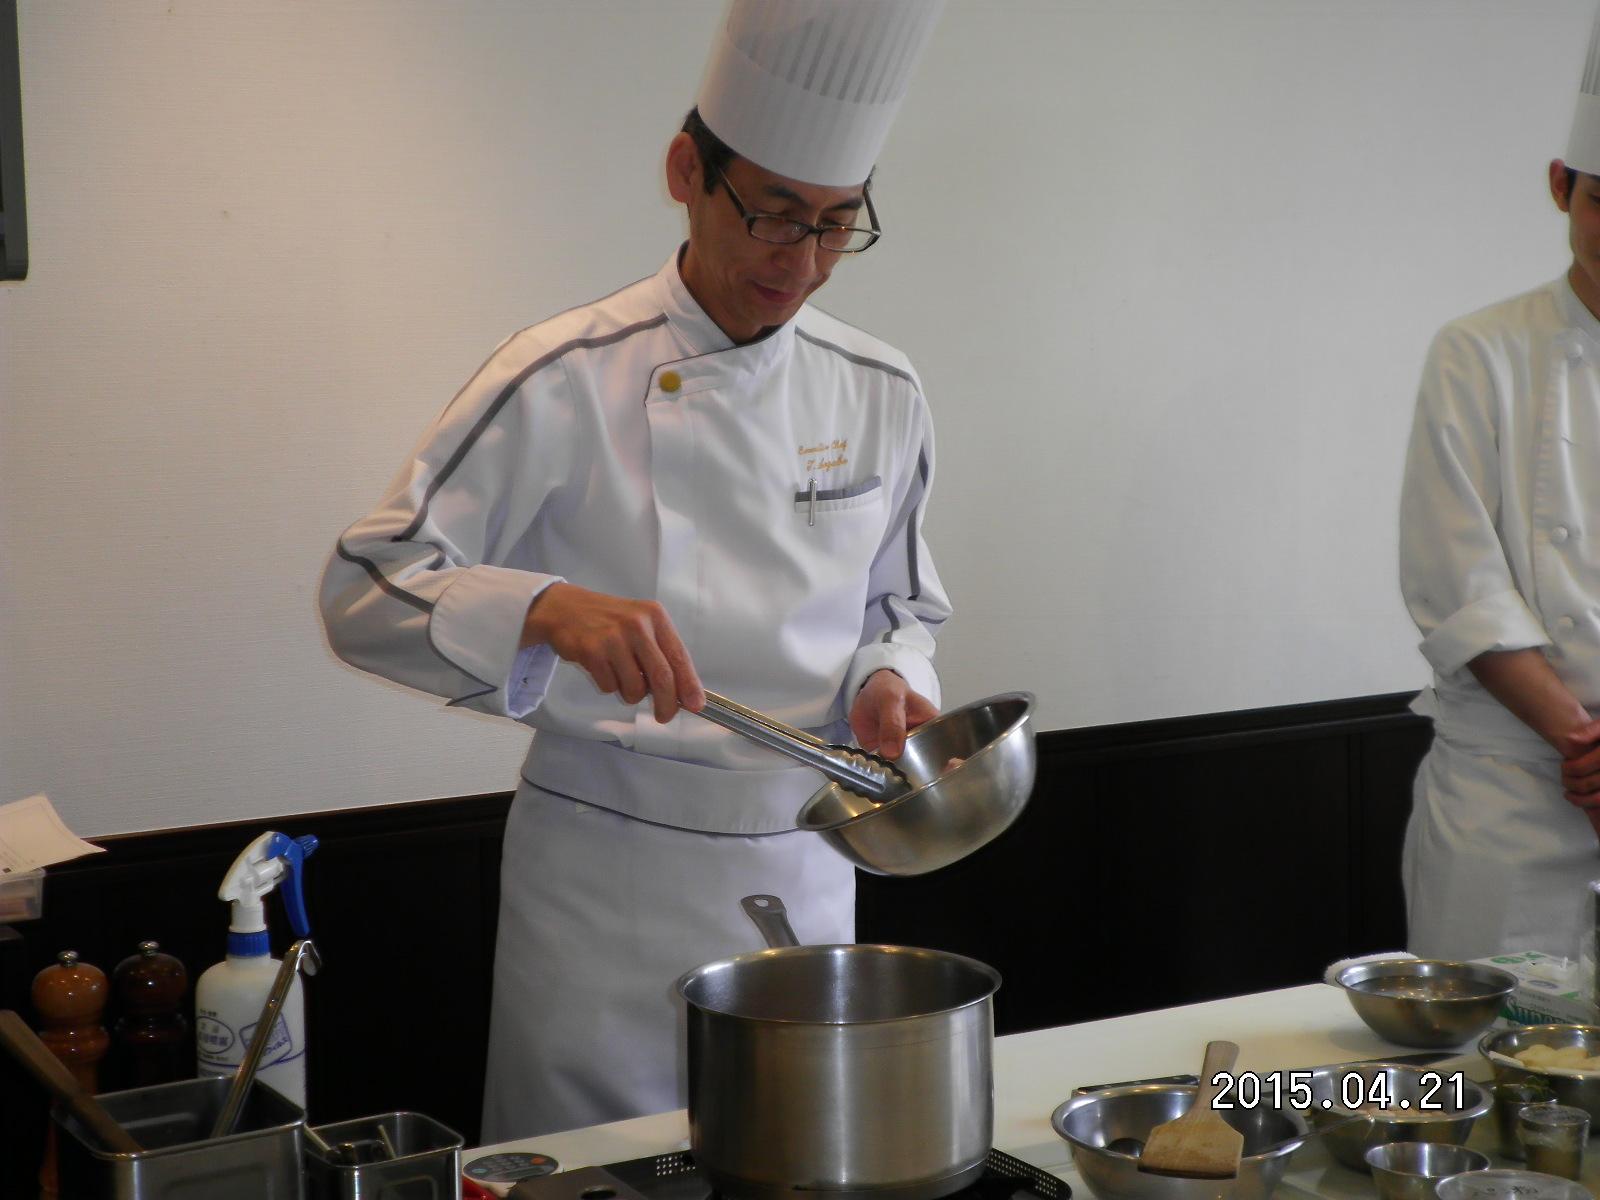 第48回お料理教室_e0190287_19523338.jpg